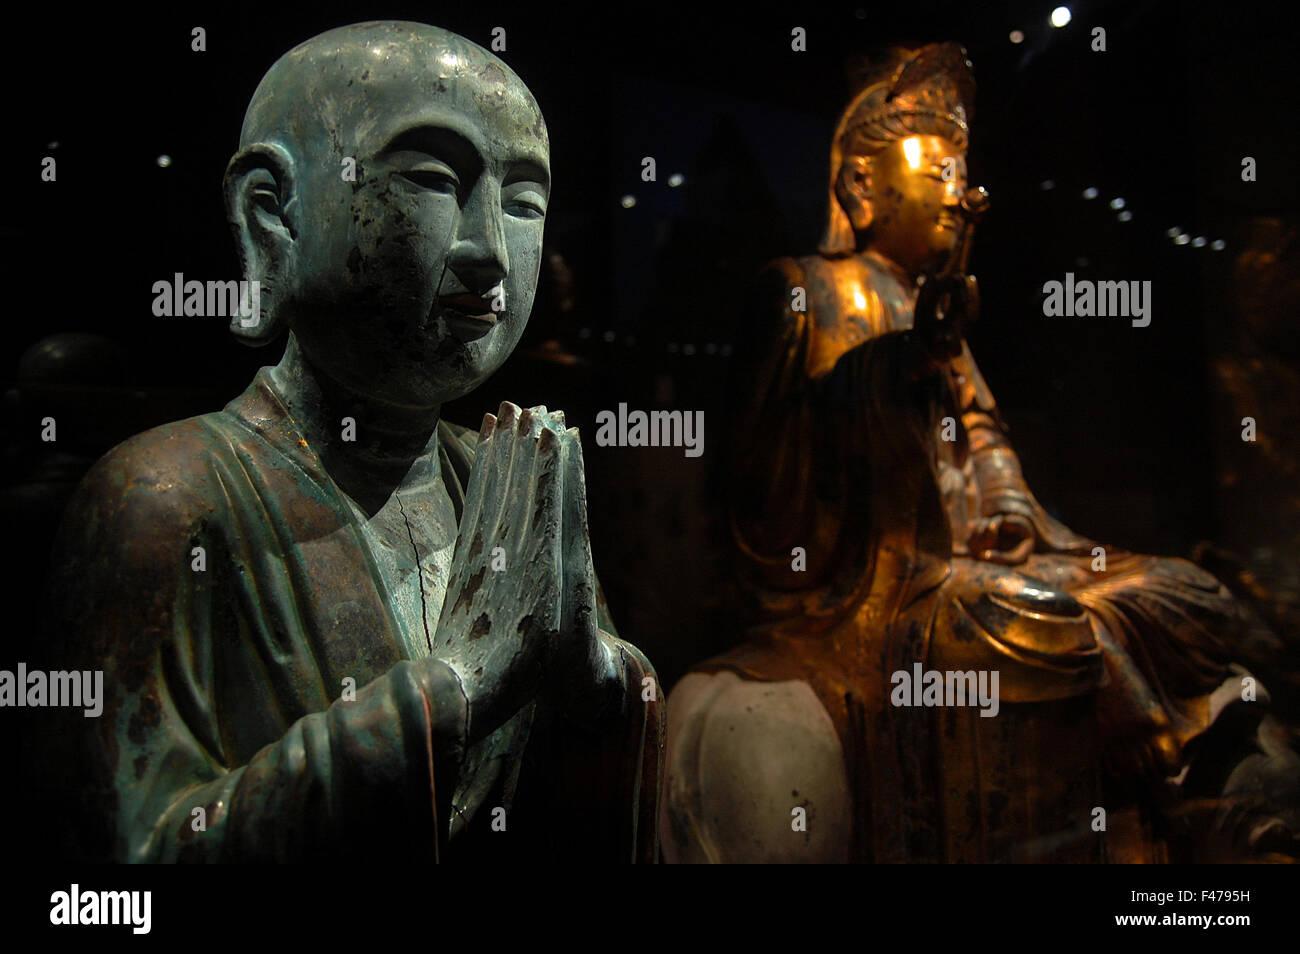 Bronze figure of Buddha praying at the Asian Civilisations Museum in Singapore - Stock Image